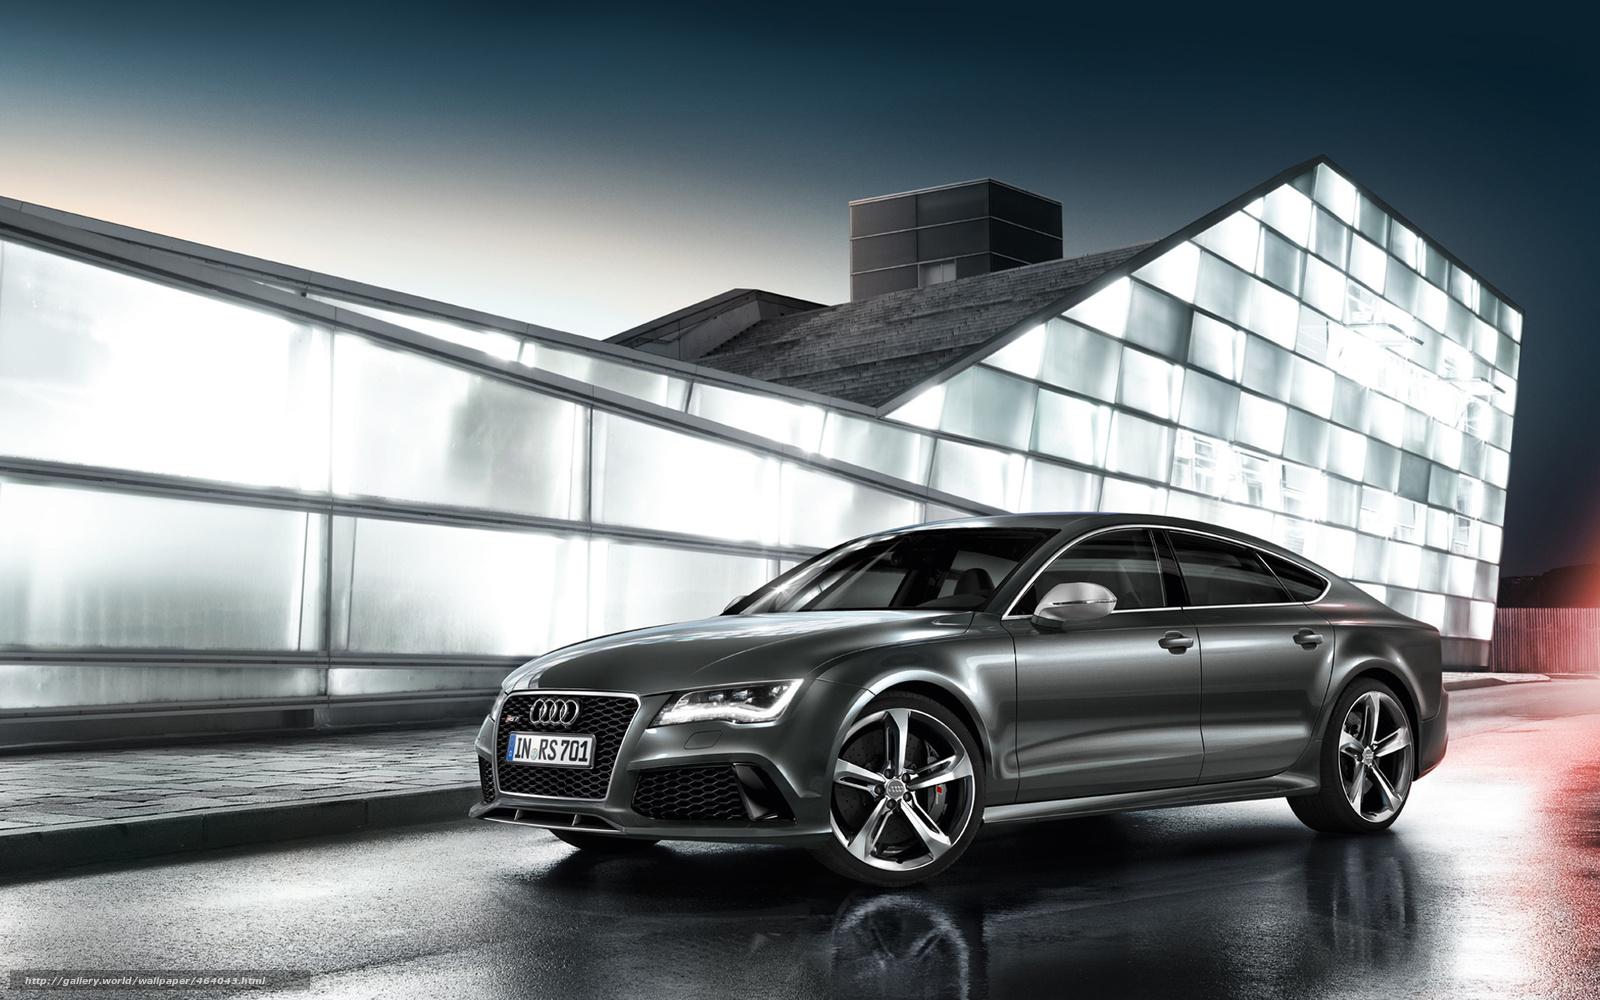 Download Hintergrund Audi Rs7 Sportback Grau Freie